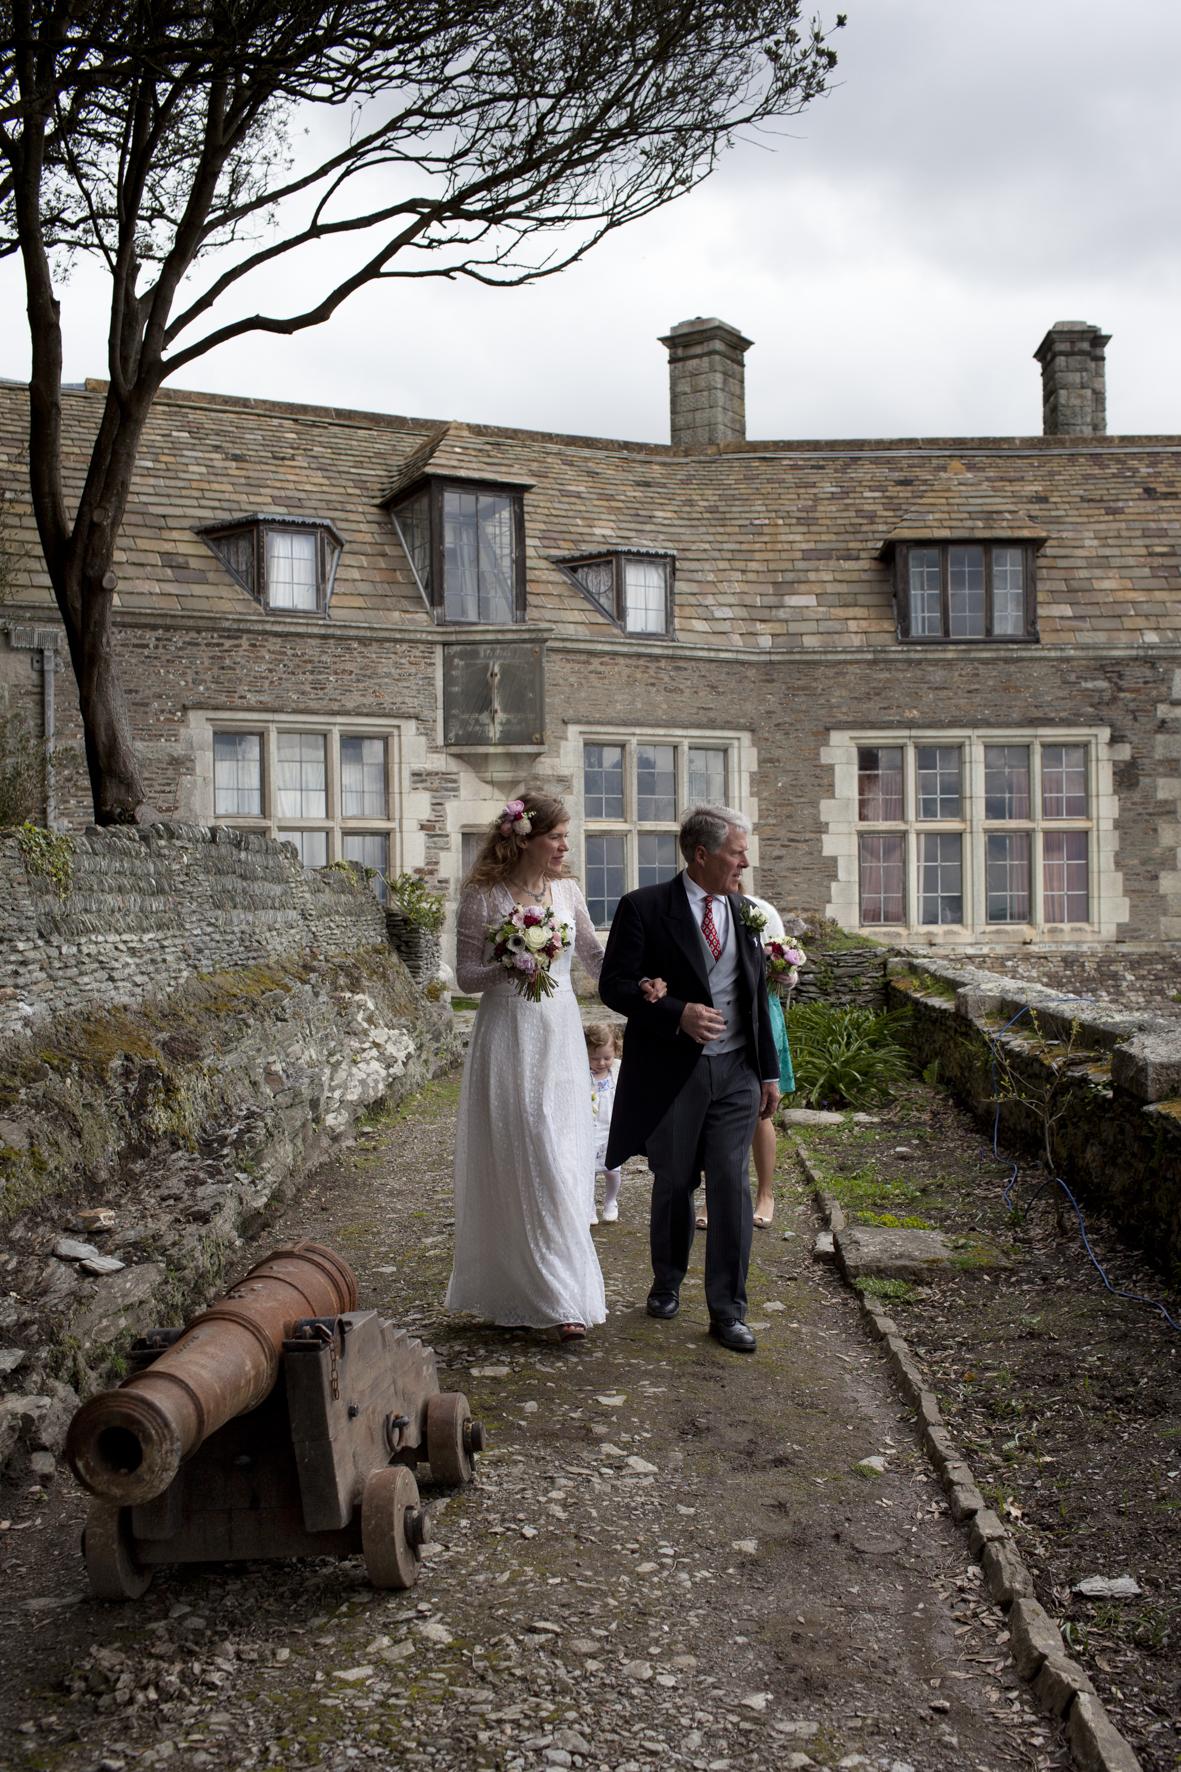 Wedding example_M&P__MG_3292_Claudia Leisinger.jpg